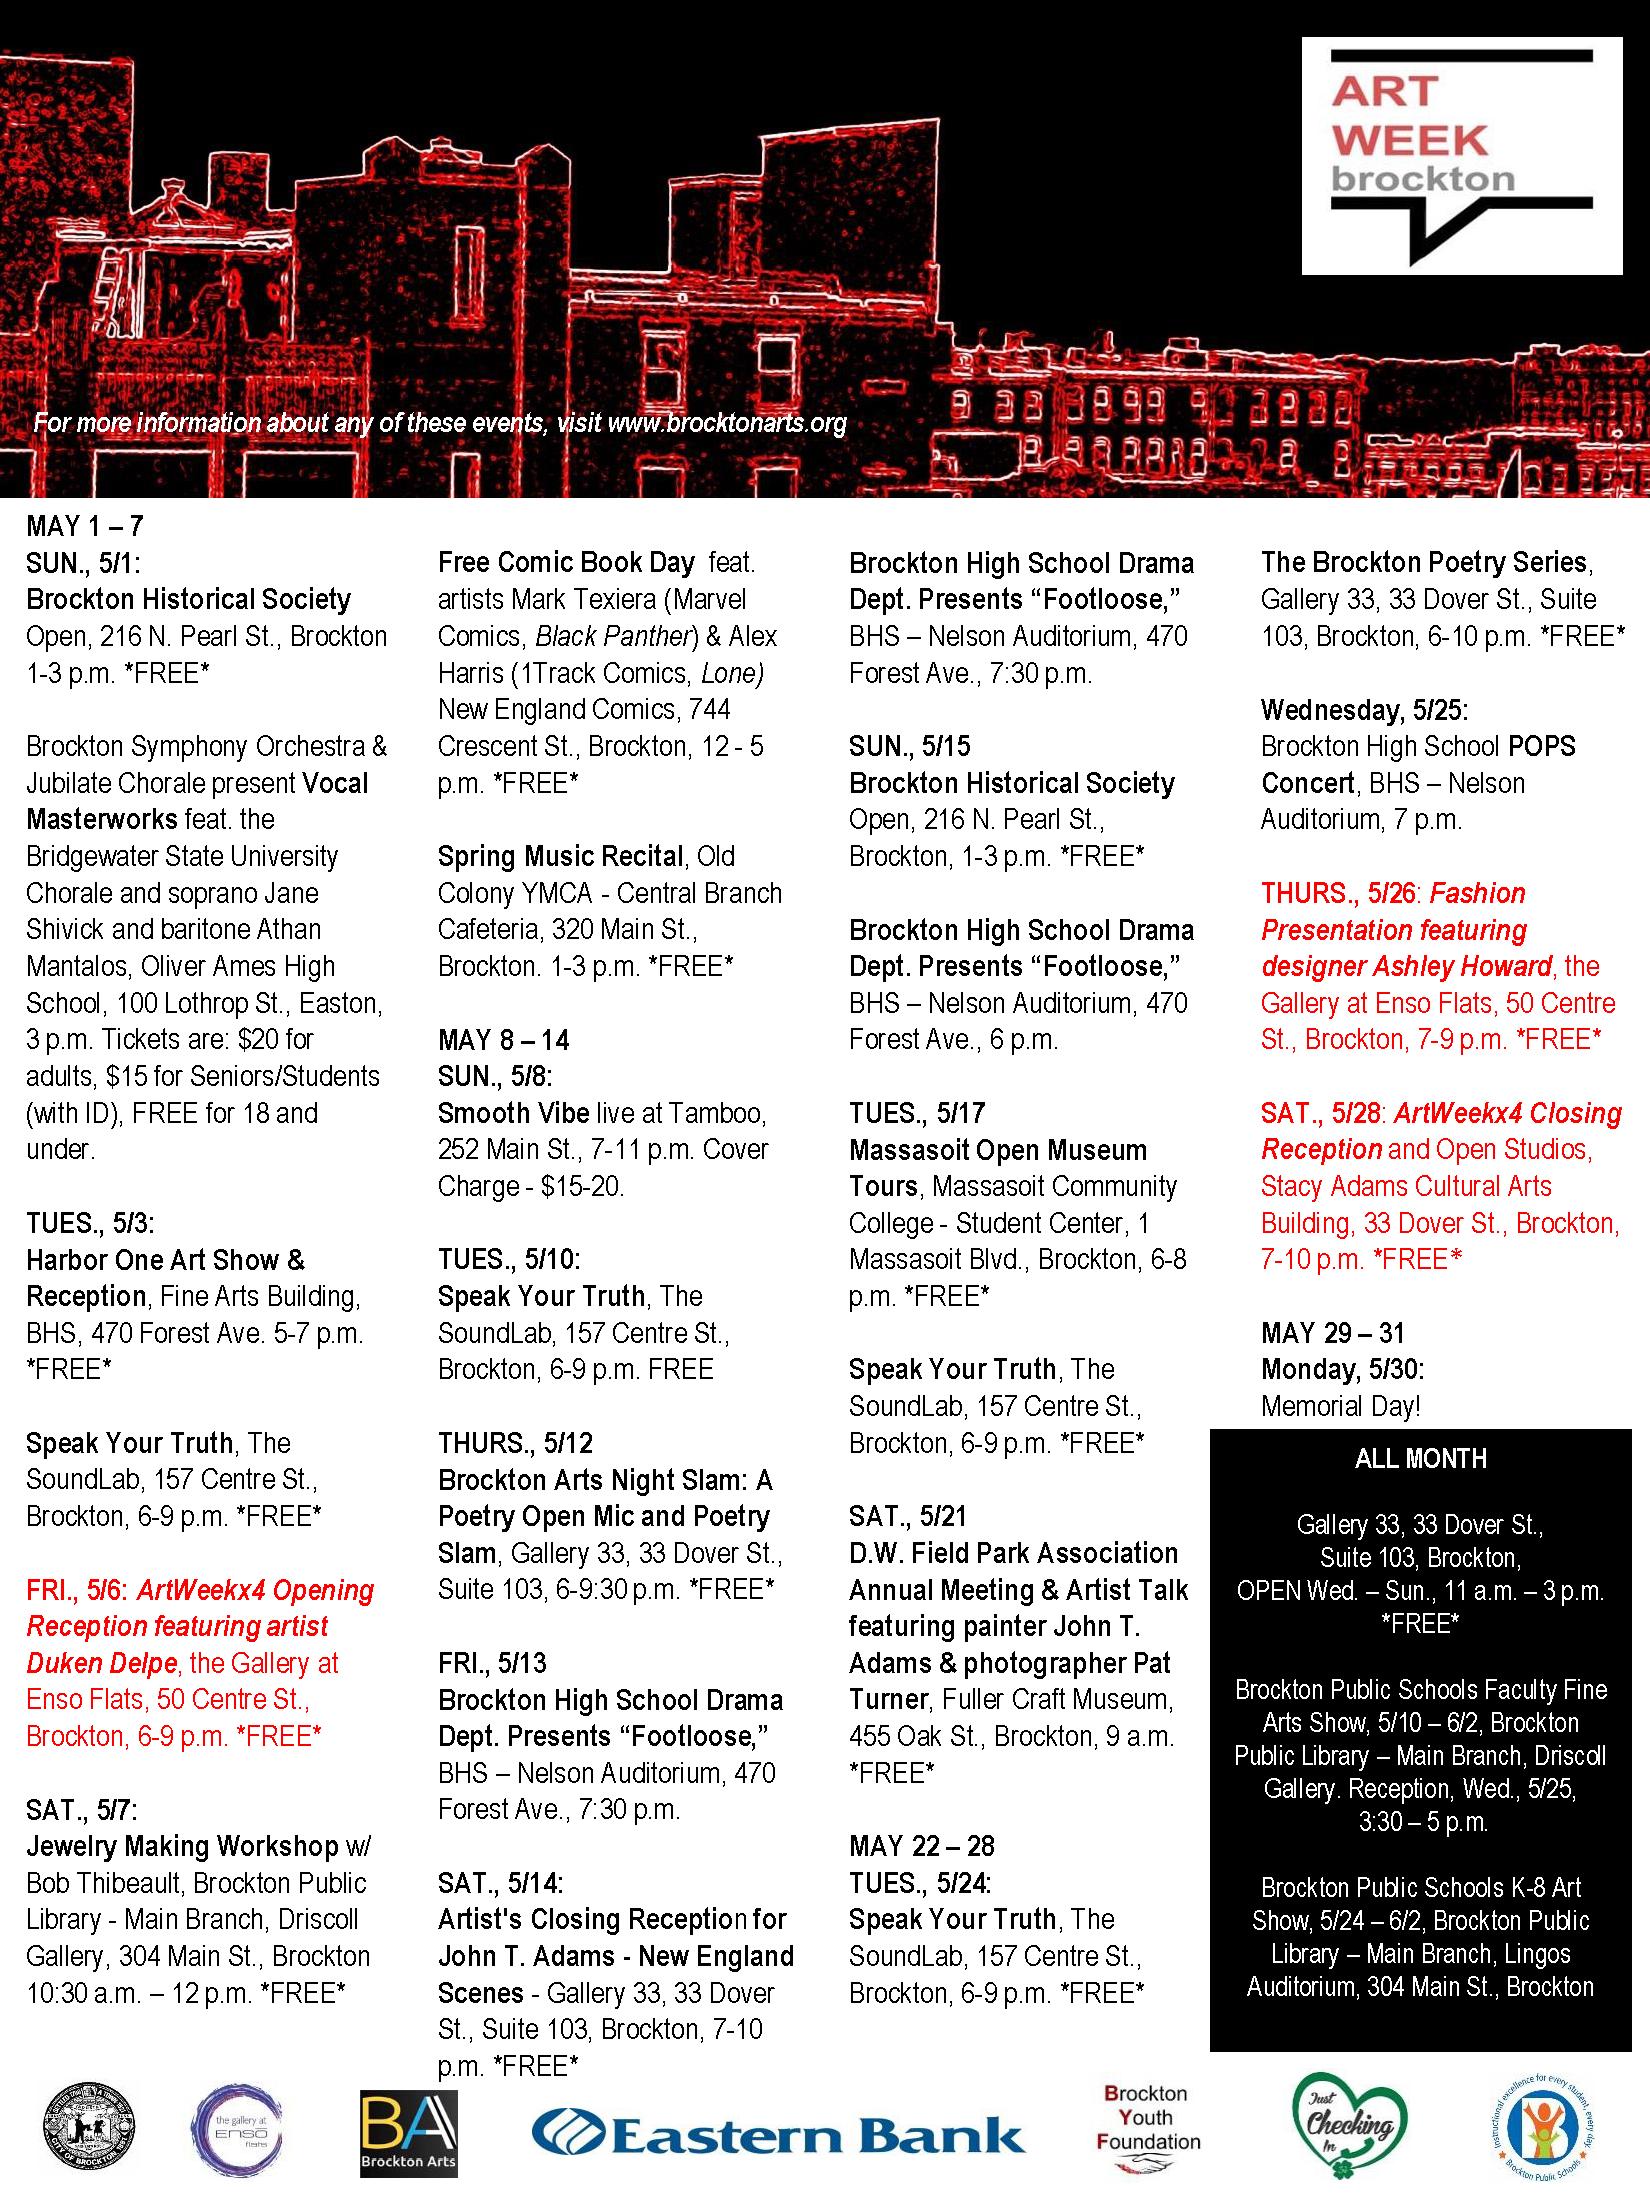 Updated ArtWeek 4 Brockton May calendar - 2016[2]